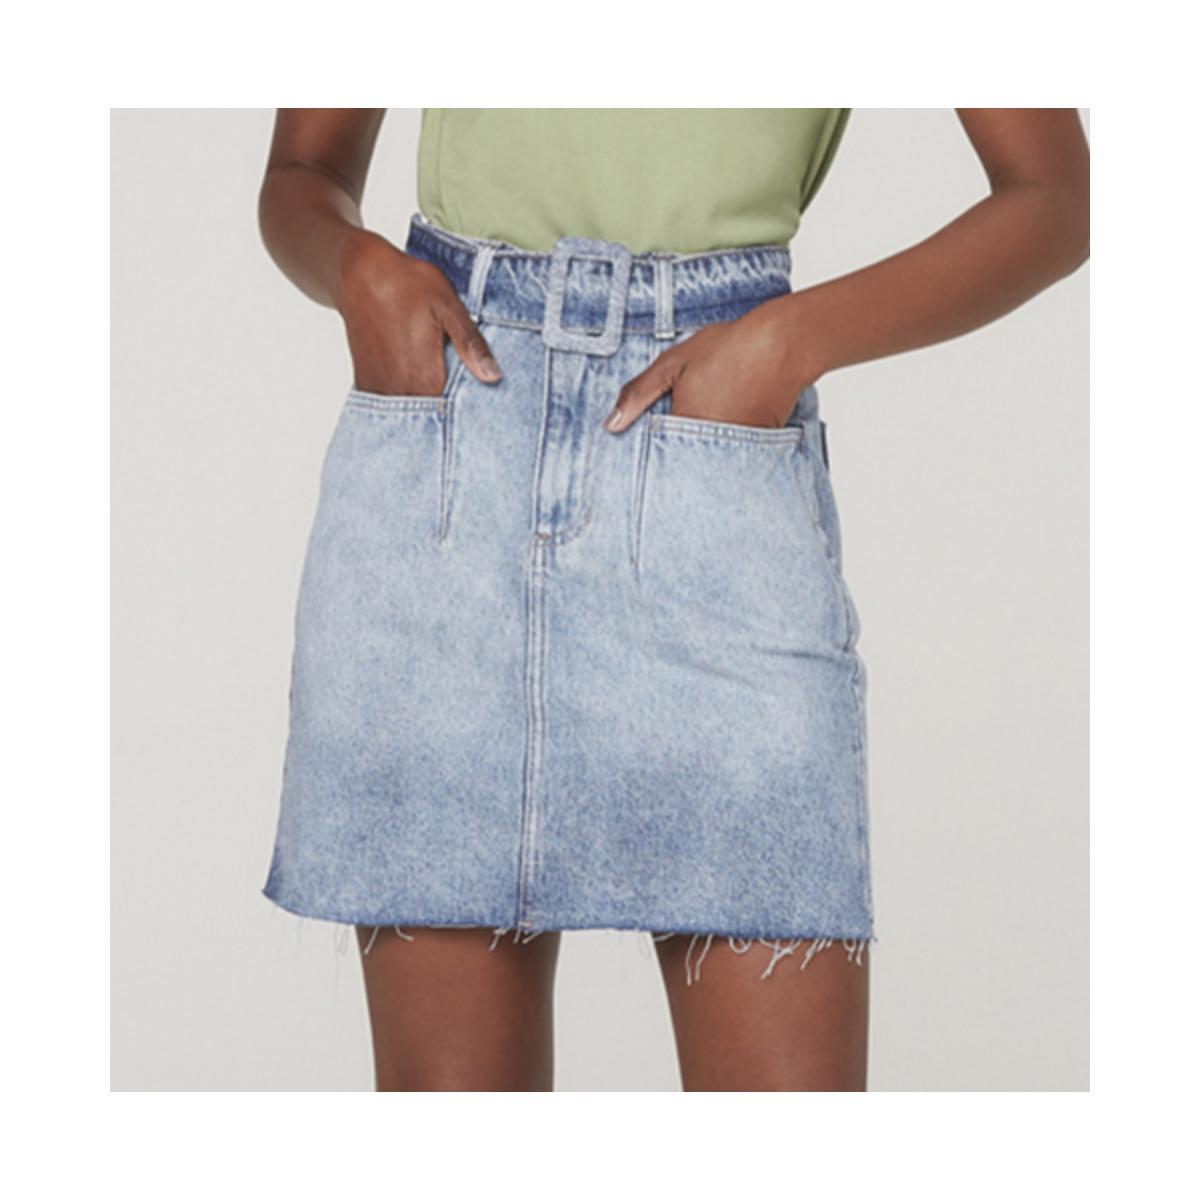 Saia Feminina Dzarm Zbmm 1asn Jeans